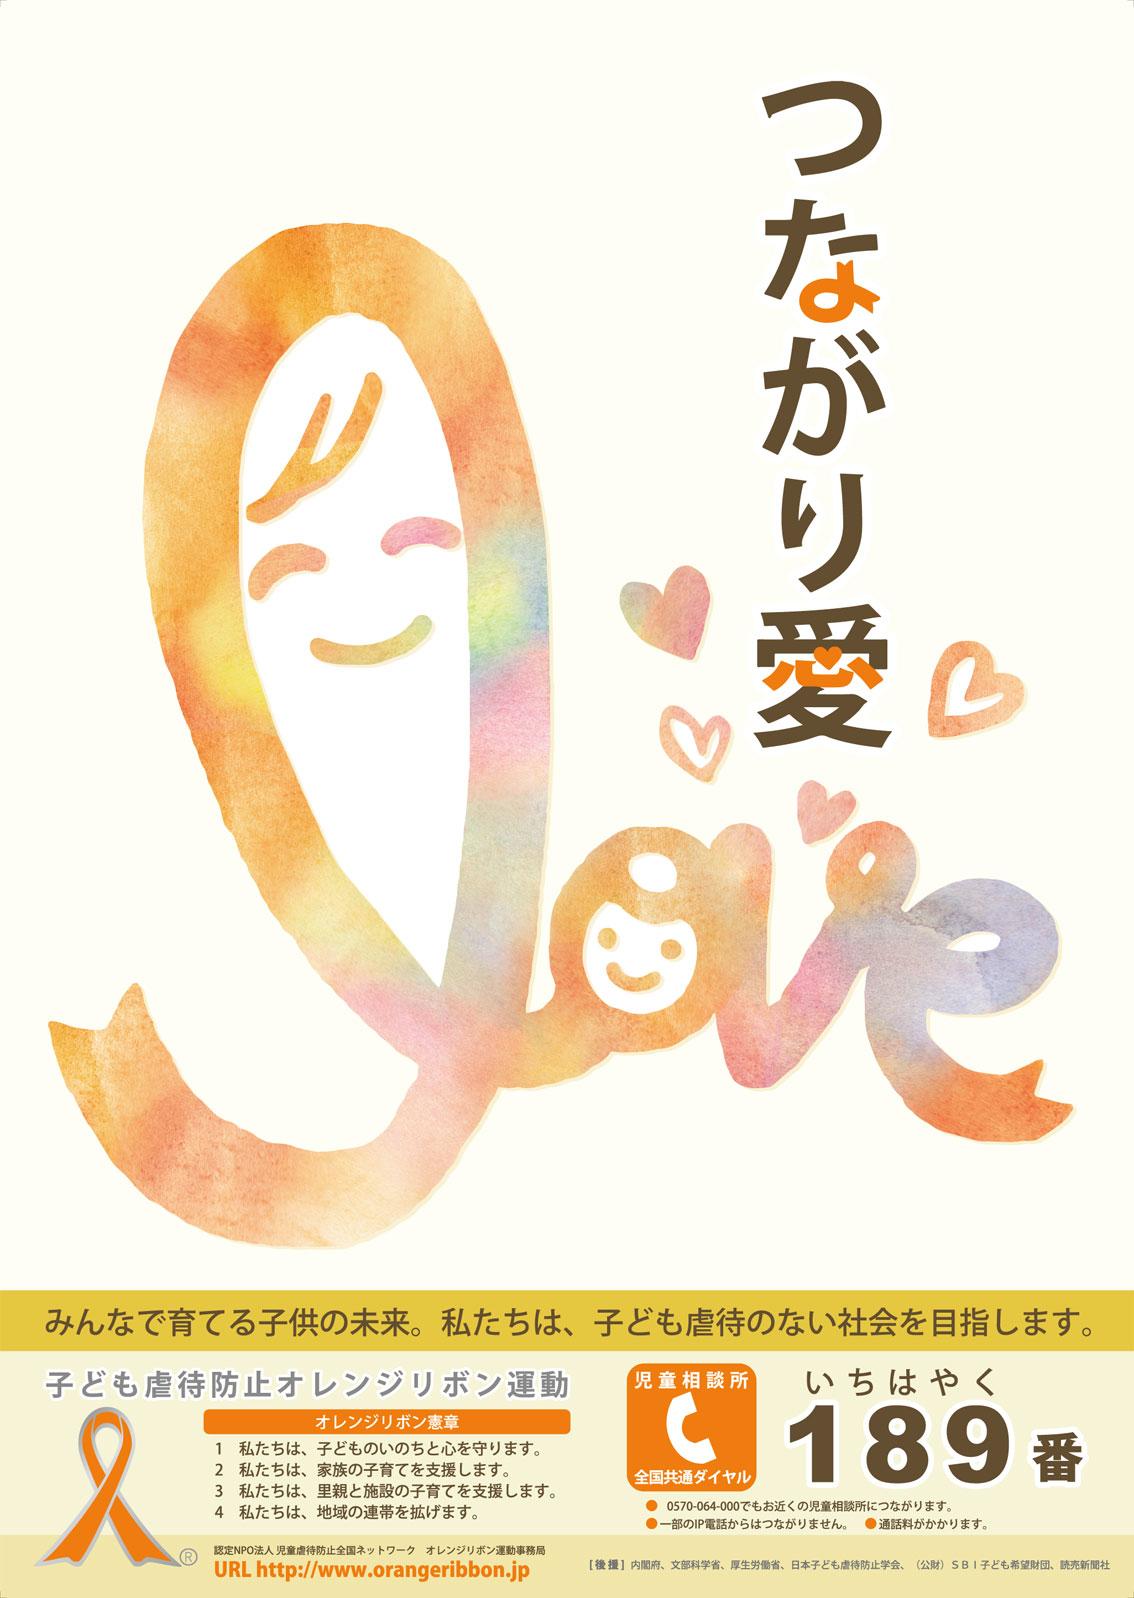 http://www.orangeribbon.jp/info/npo/contest/image/2015contest_Philip.jpg